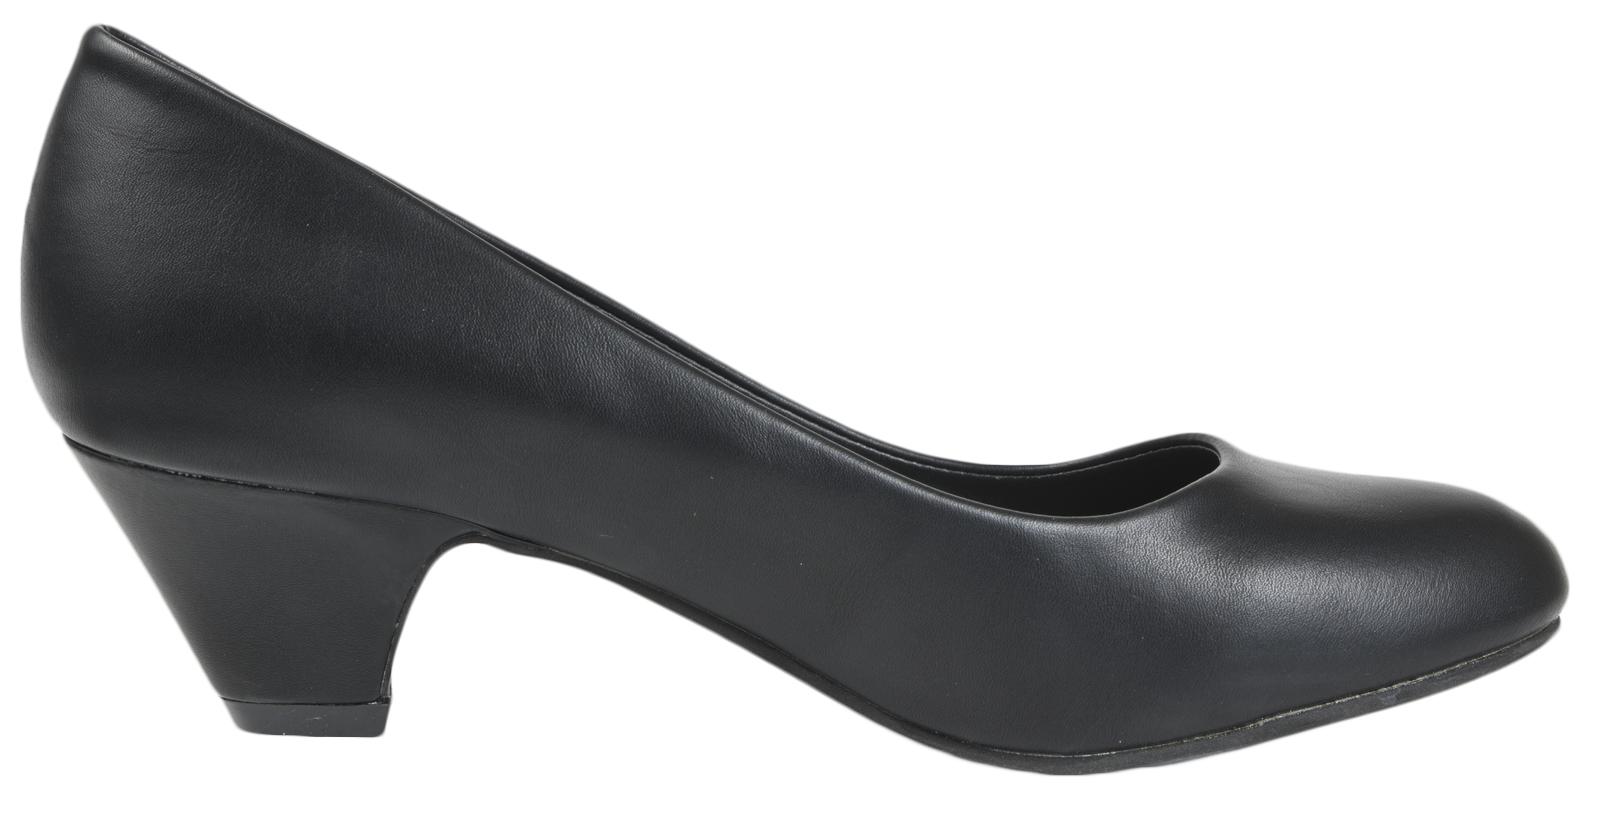 Ladies-Leather-Lined-Low-Block-Heels-Comfort-Work-Office-Court-Shoes-Ladies-Size miniatuur 21